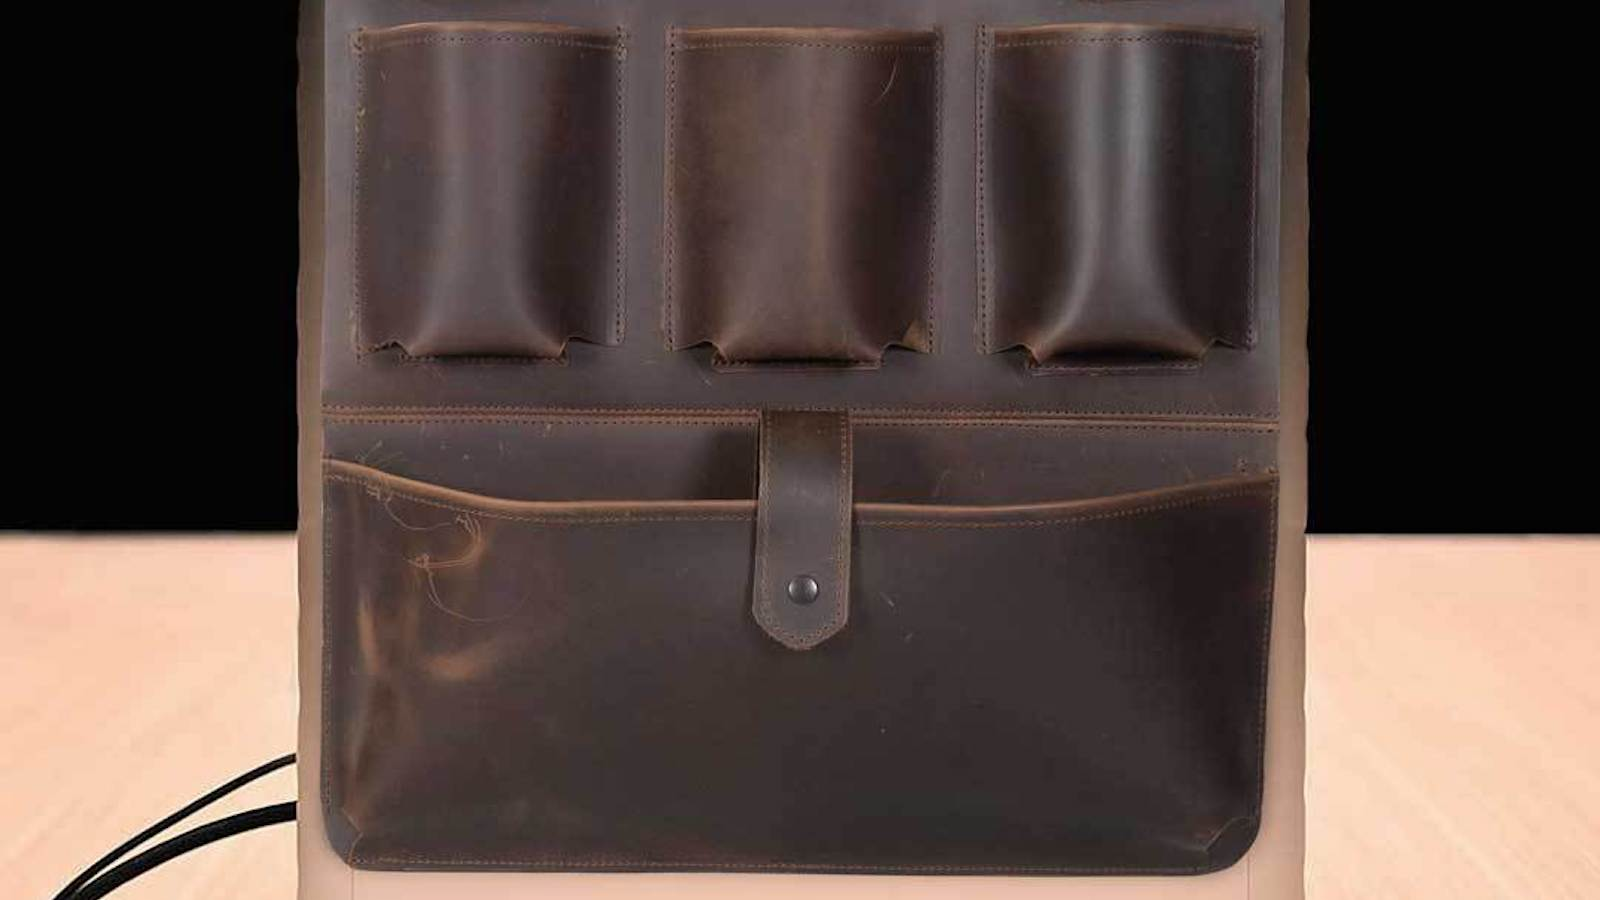 WaterField Designs Mac Pro Gear Saddle Work Accessories Organizer keeps gadgets together